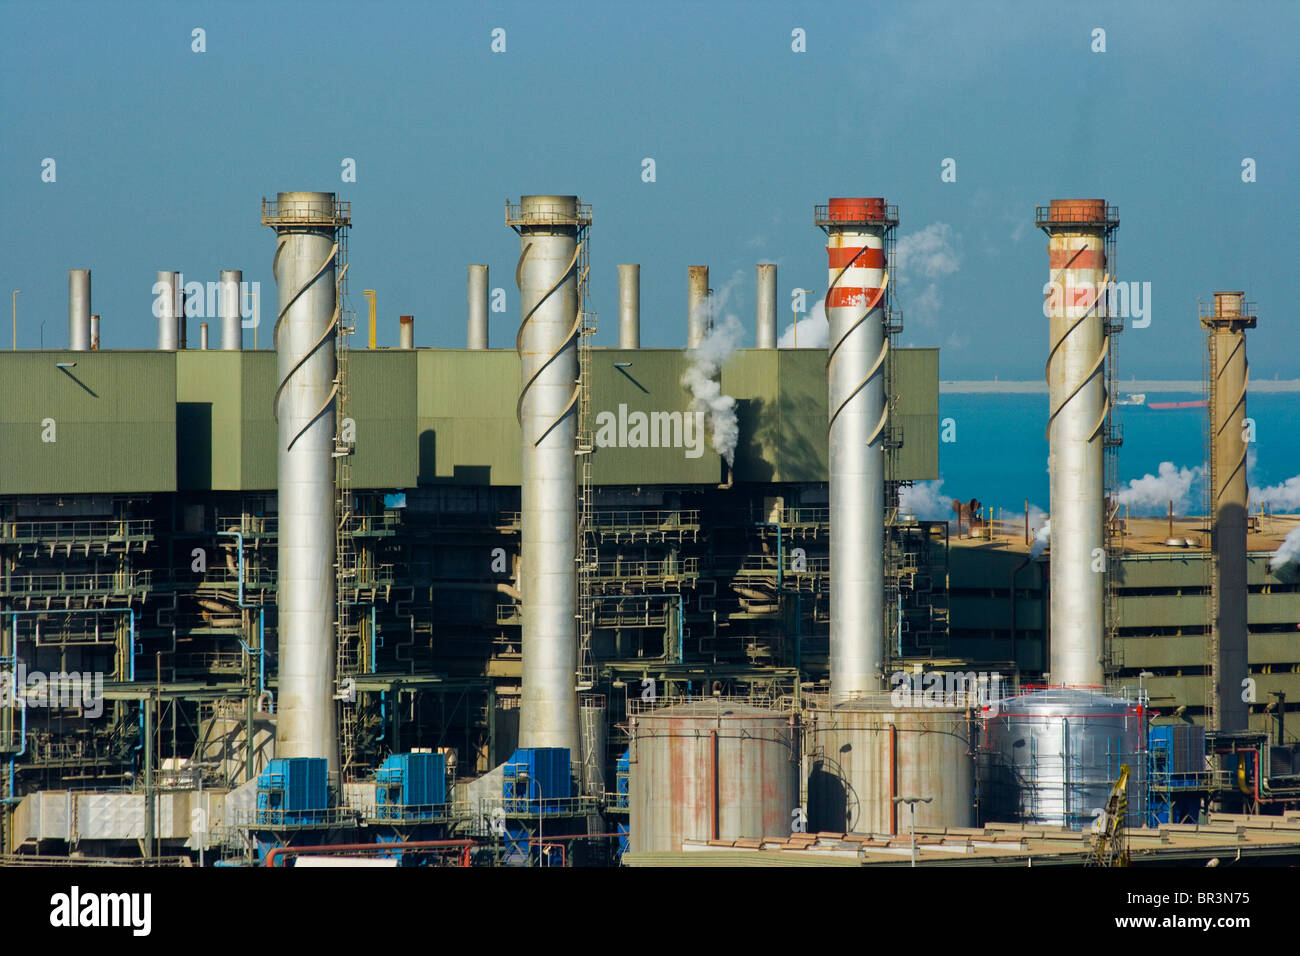 Water Desalination Plant in Sharjah, UAE Stock Photo